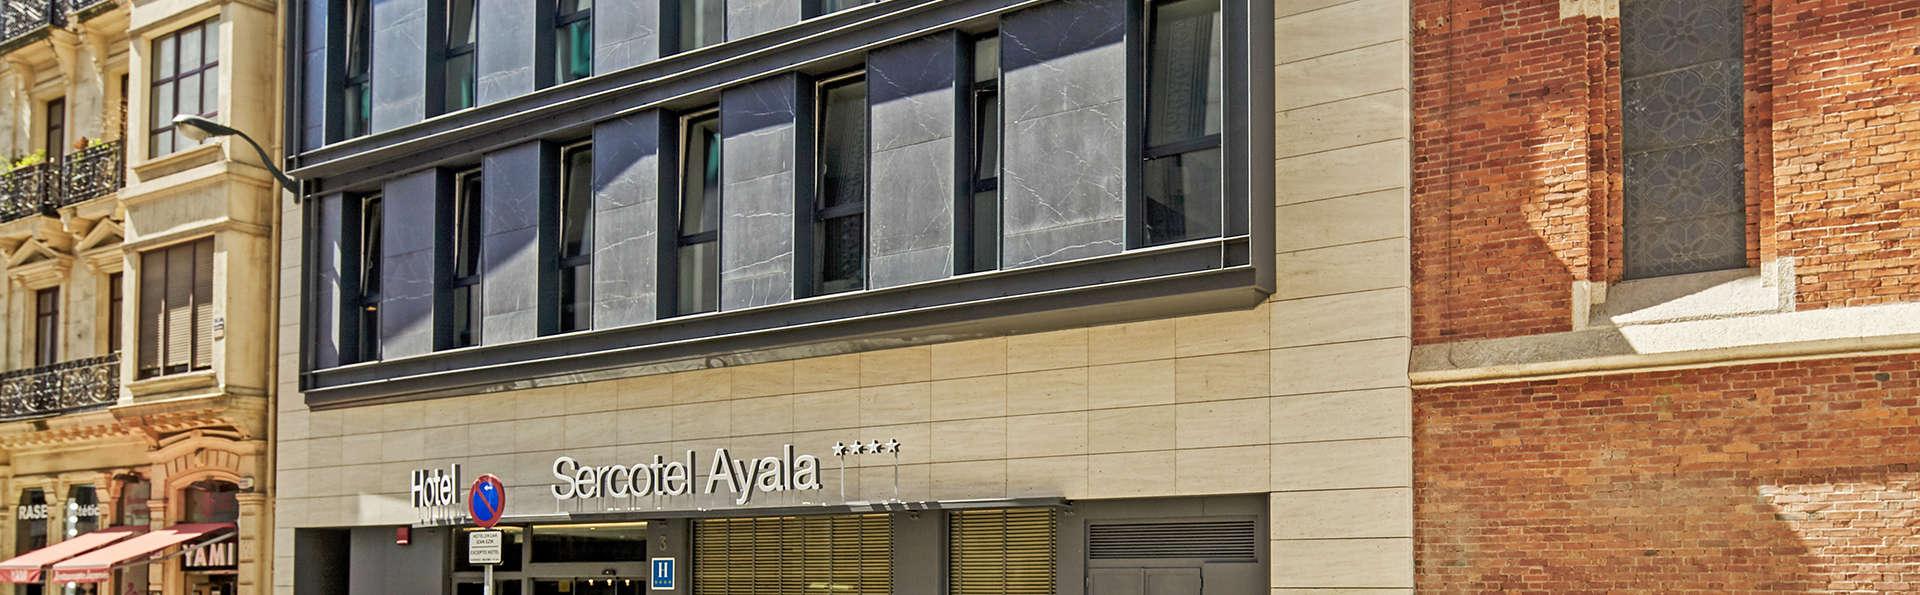 Sercotel Ayala - EDIT_FRONT_02.jpg